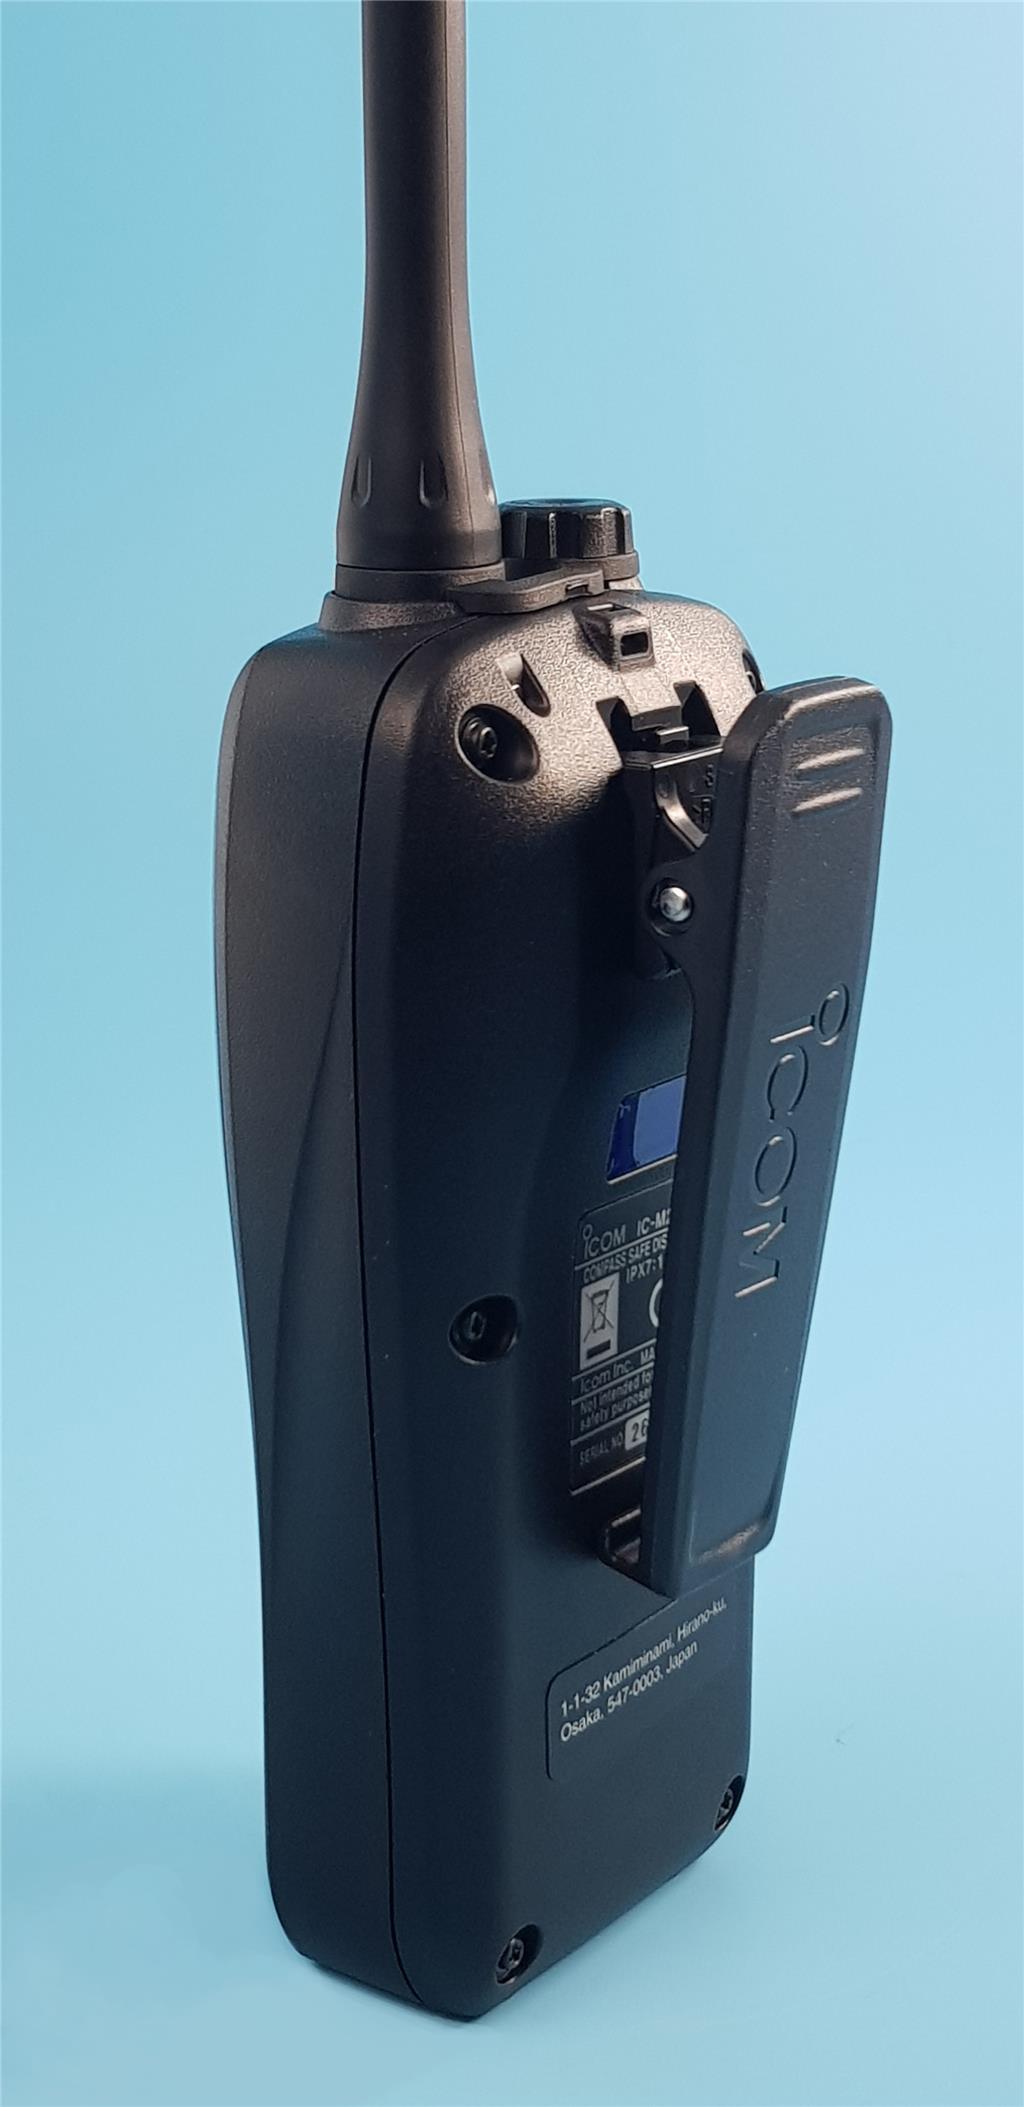 The all new Icom M25 hand held VHF Radio - Image 1